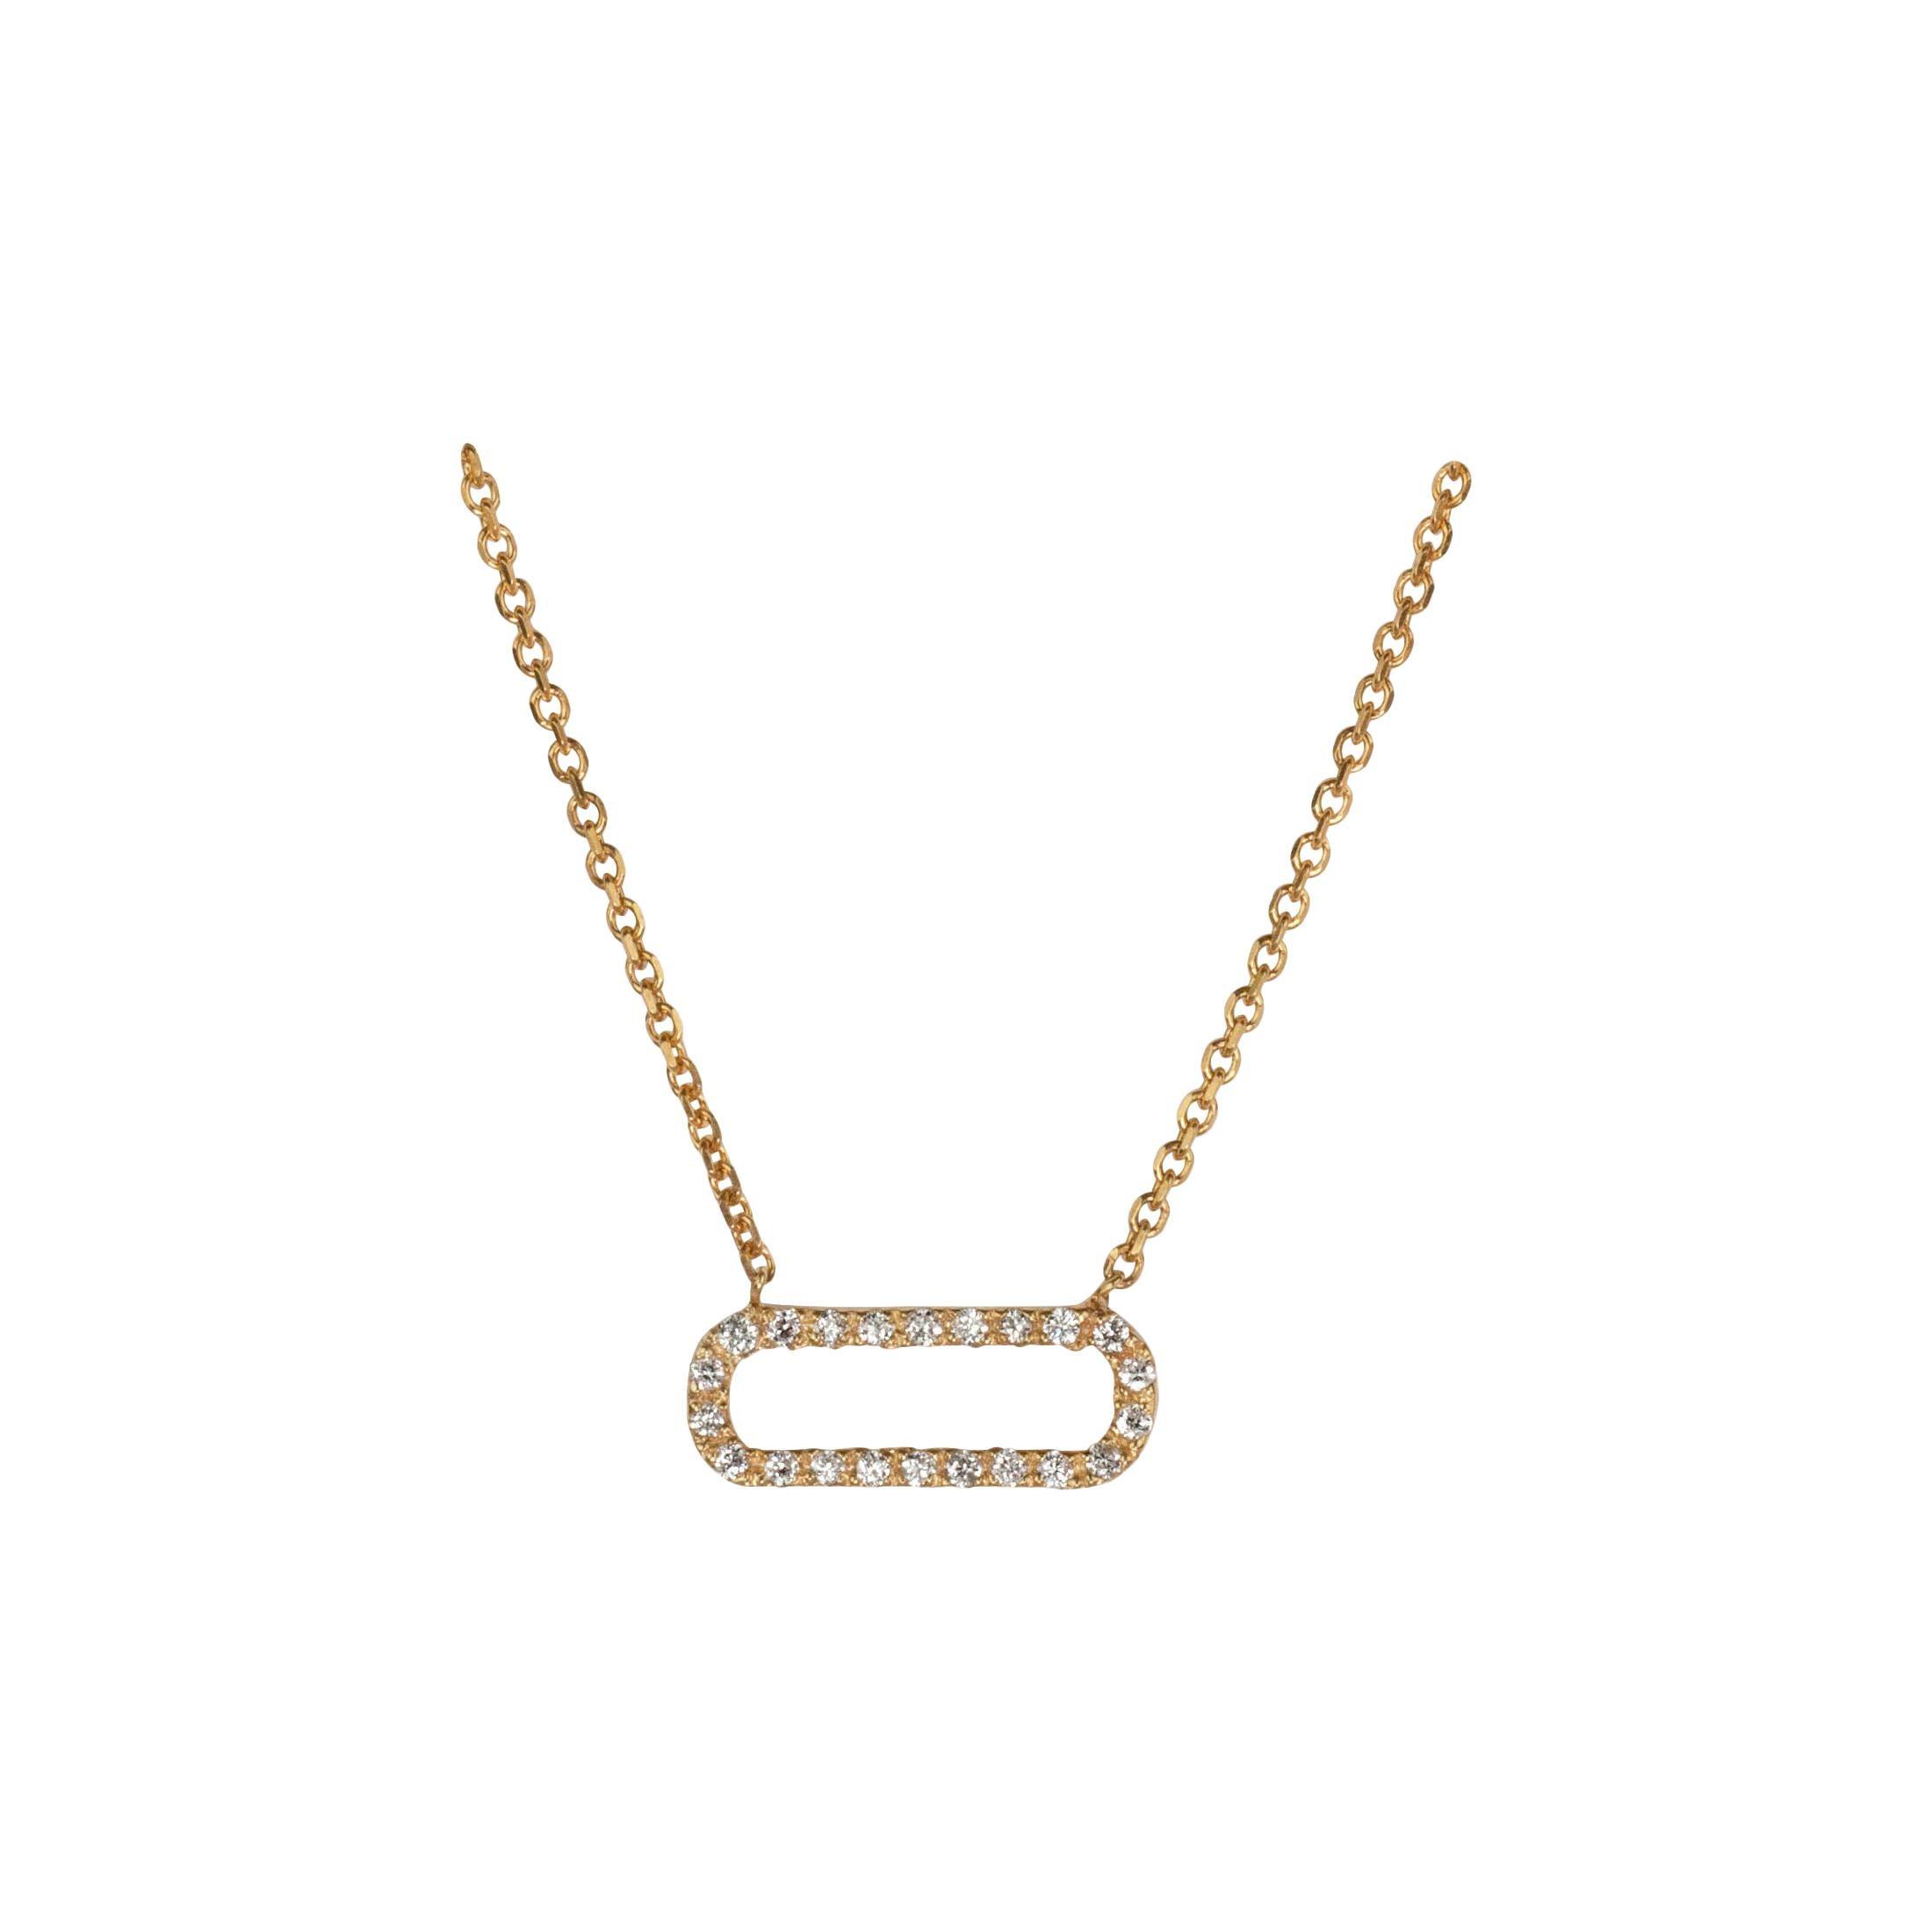 Suneera Open Circle Diamond and 14 Karat Yellow Gold Necklace